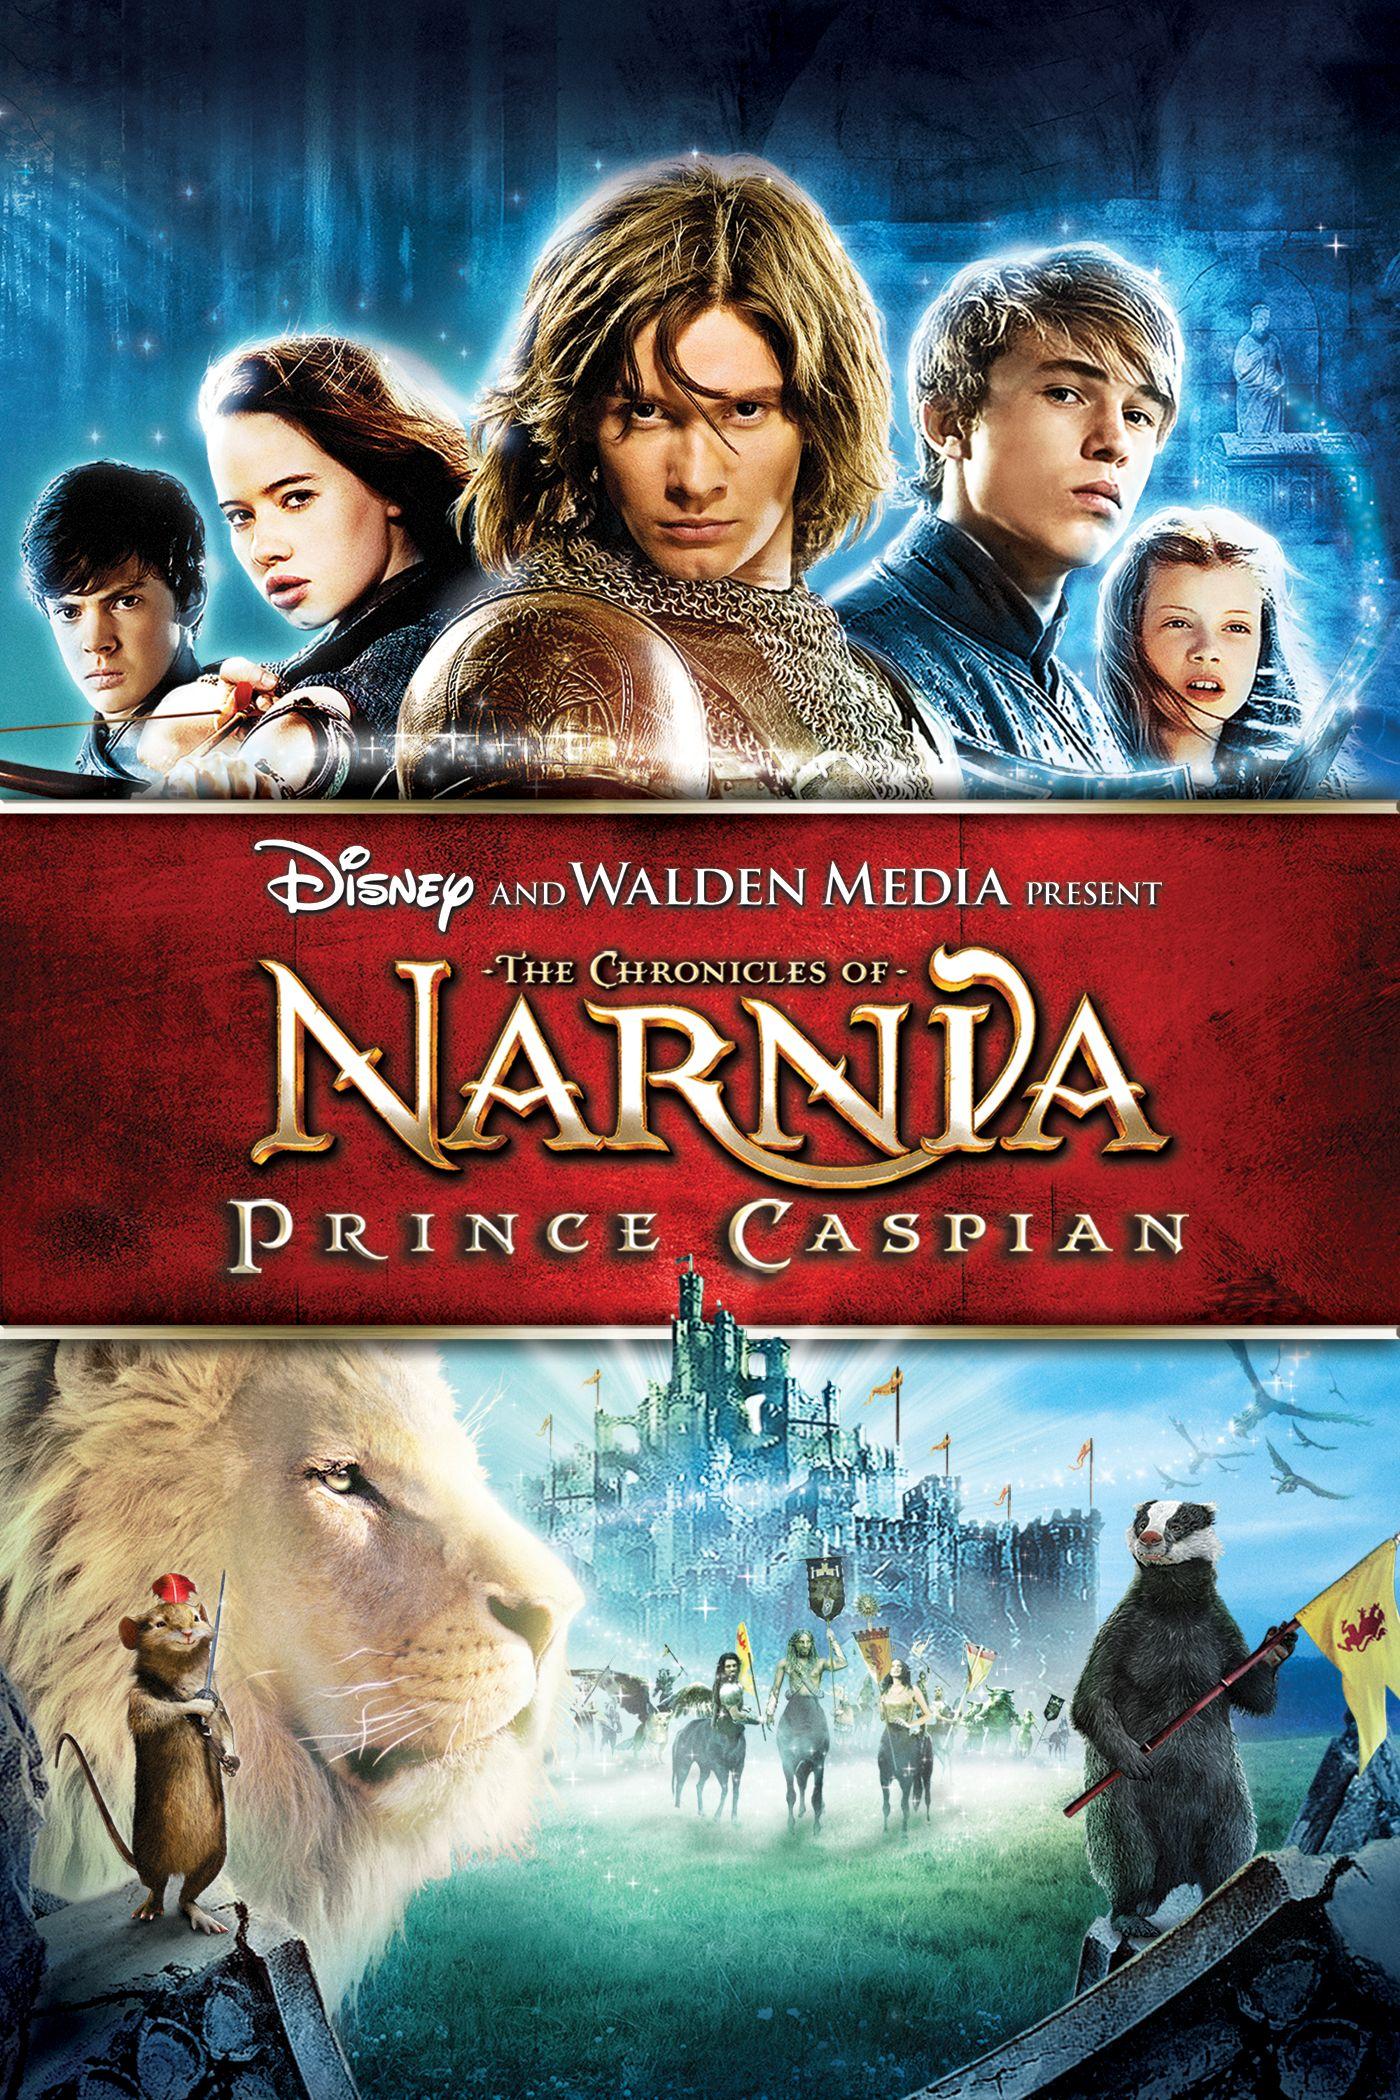 narnia prince caspian full movie free